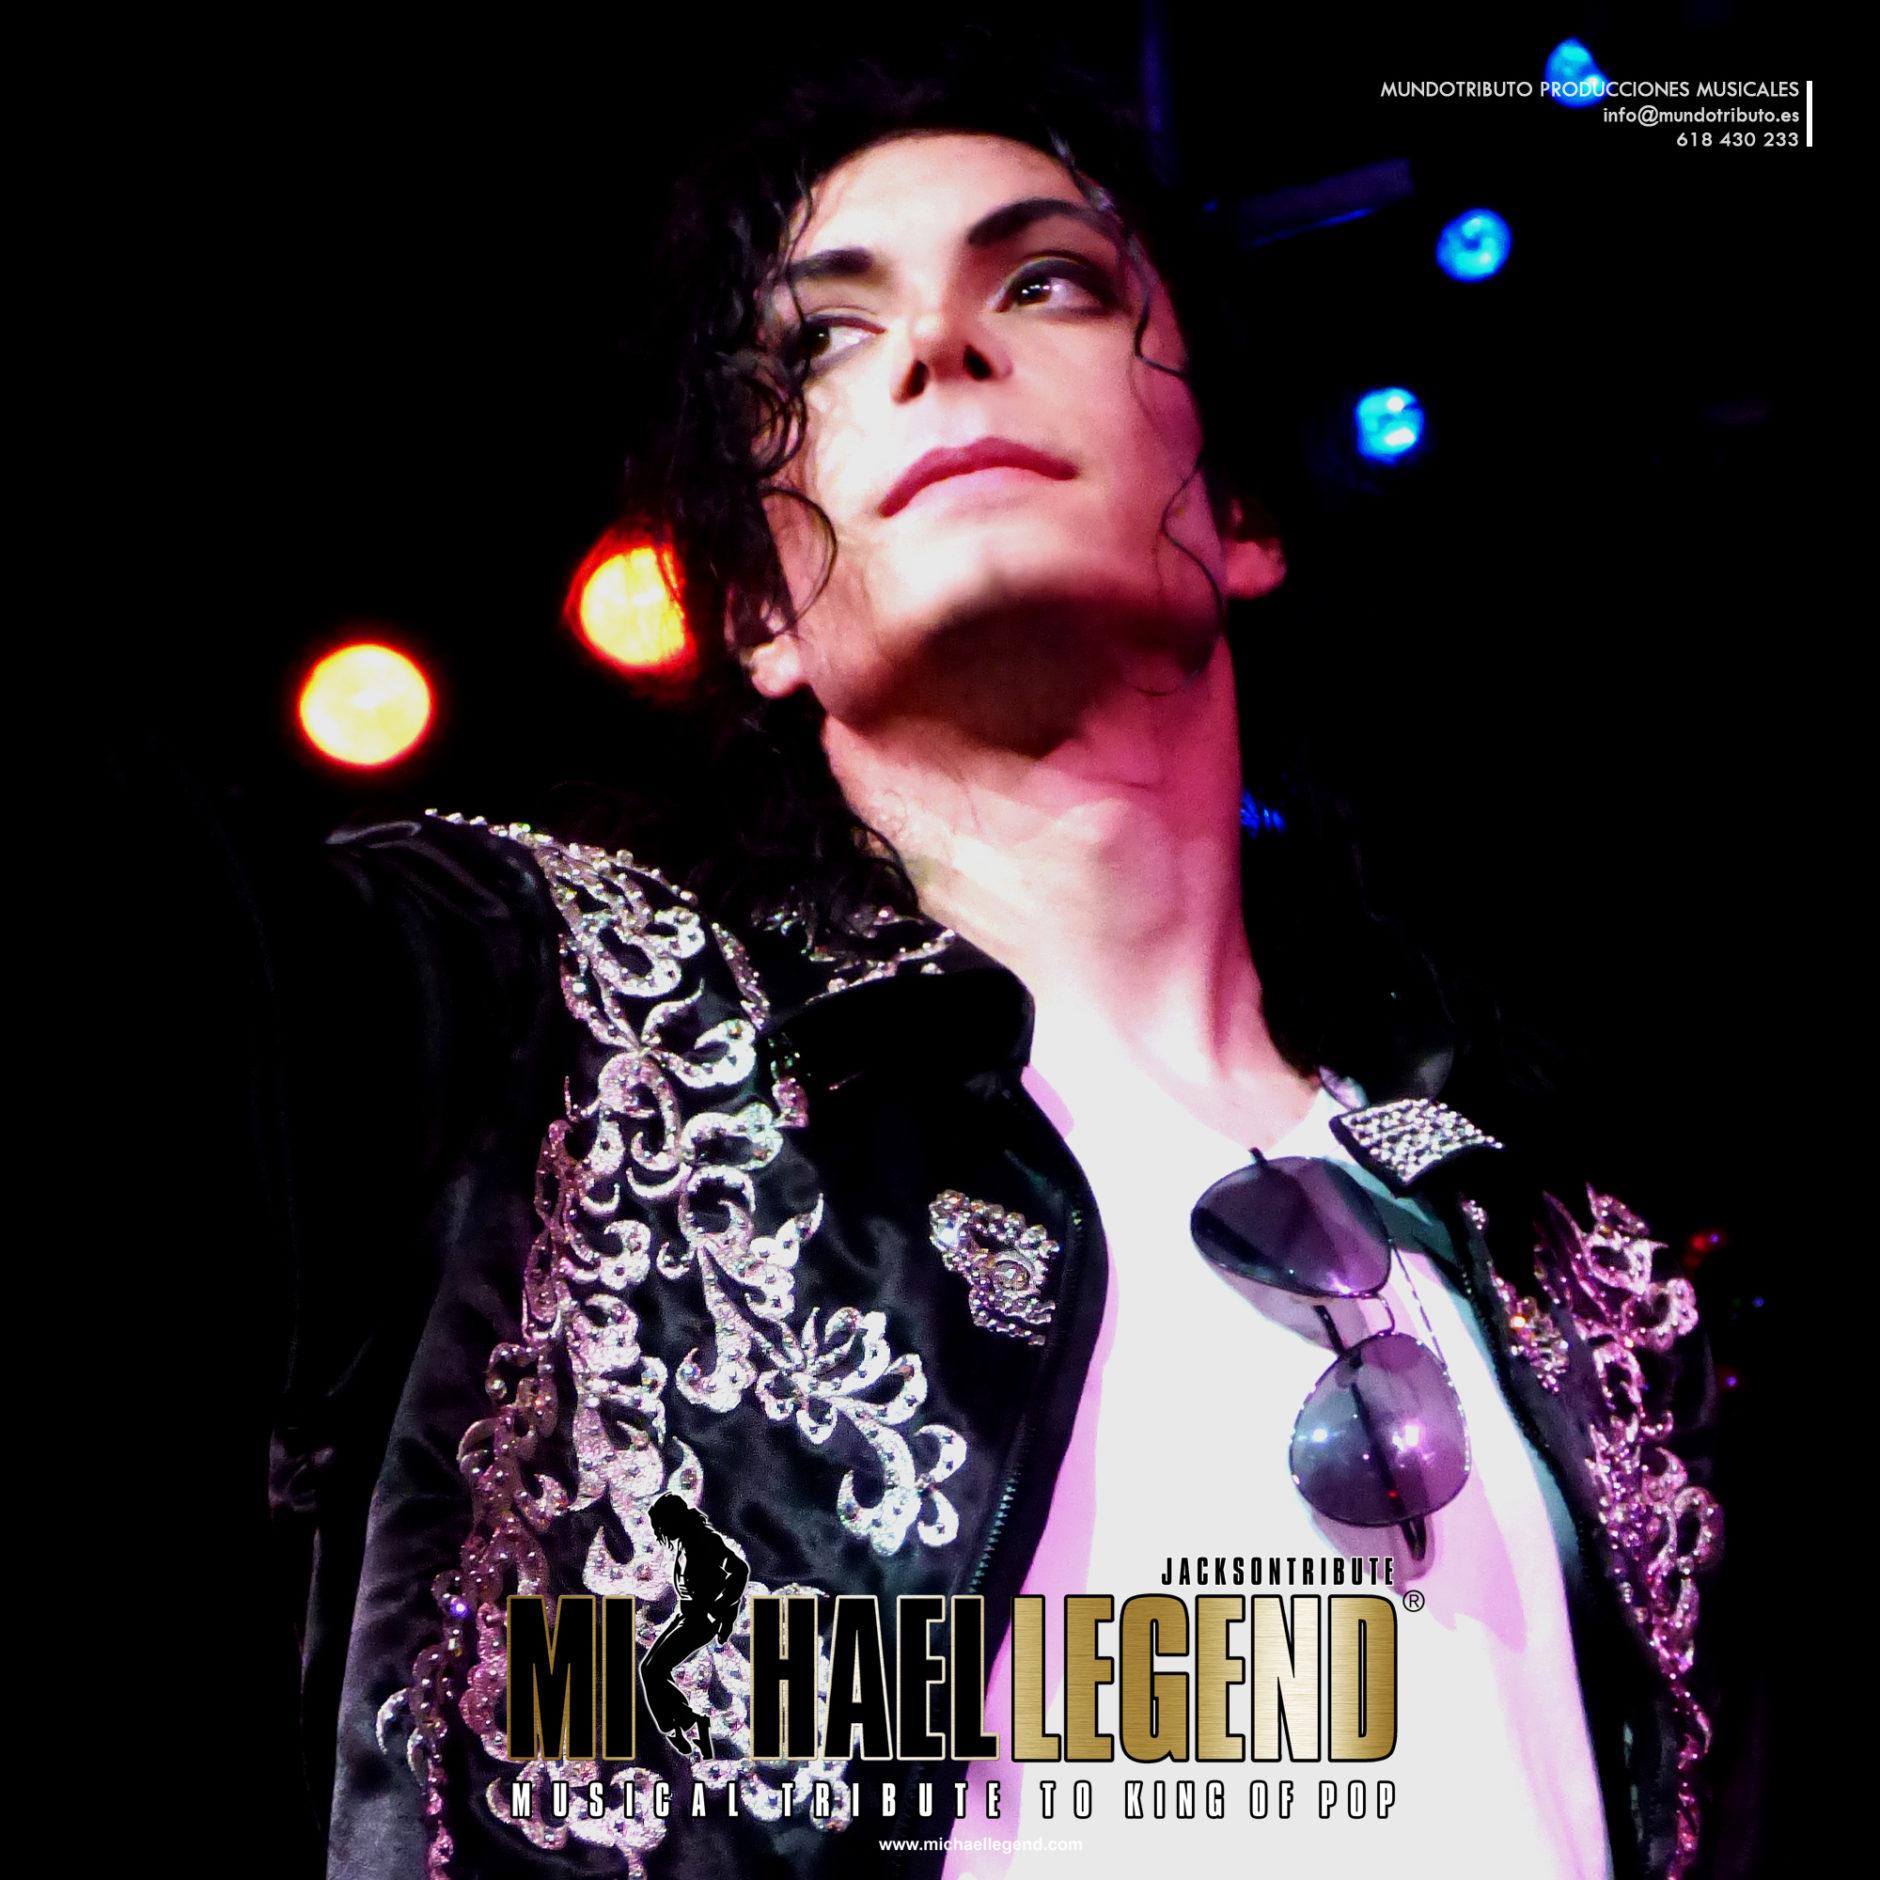 Michael Legend – Tributo a Michael Jackson 4